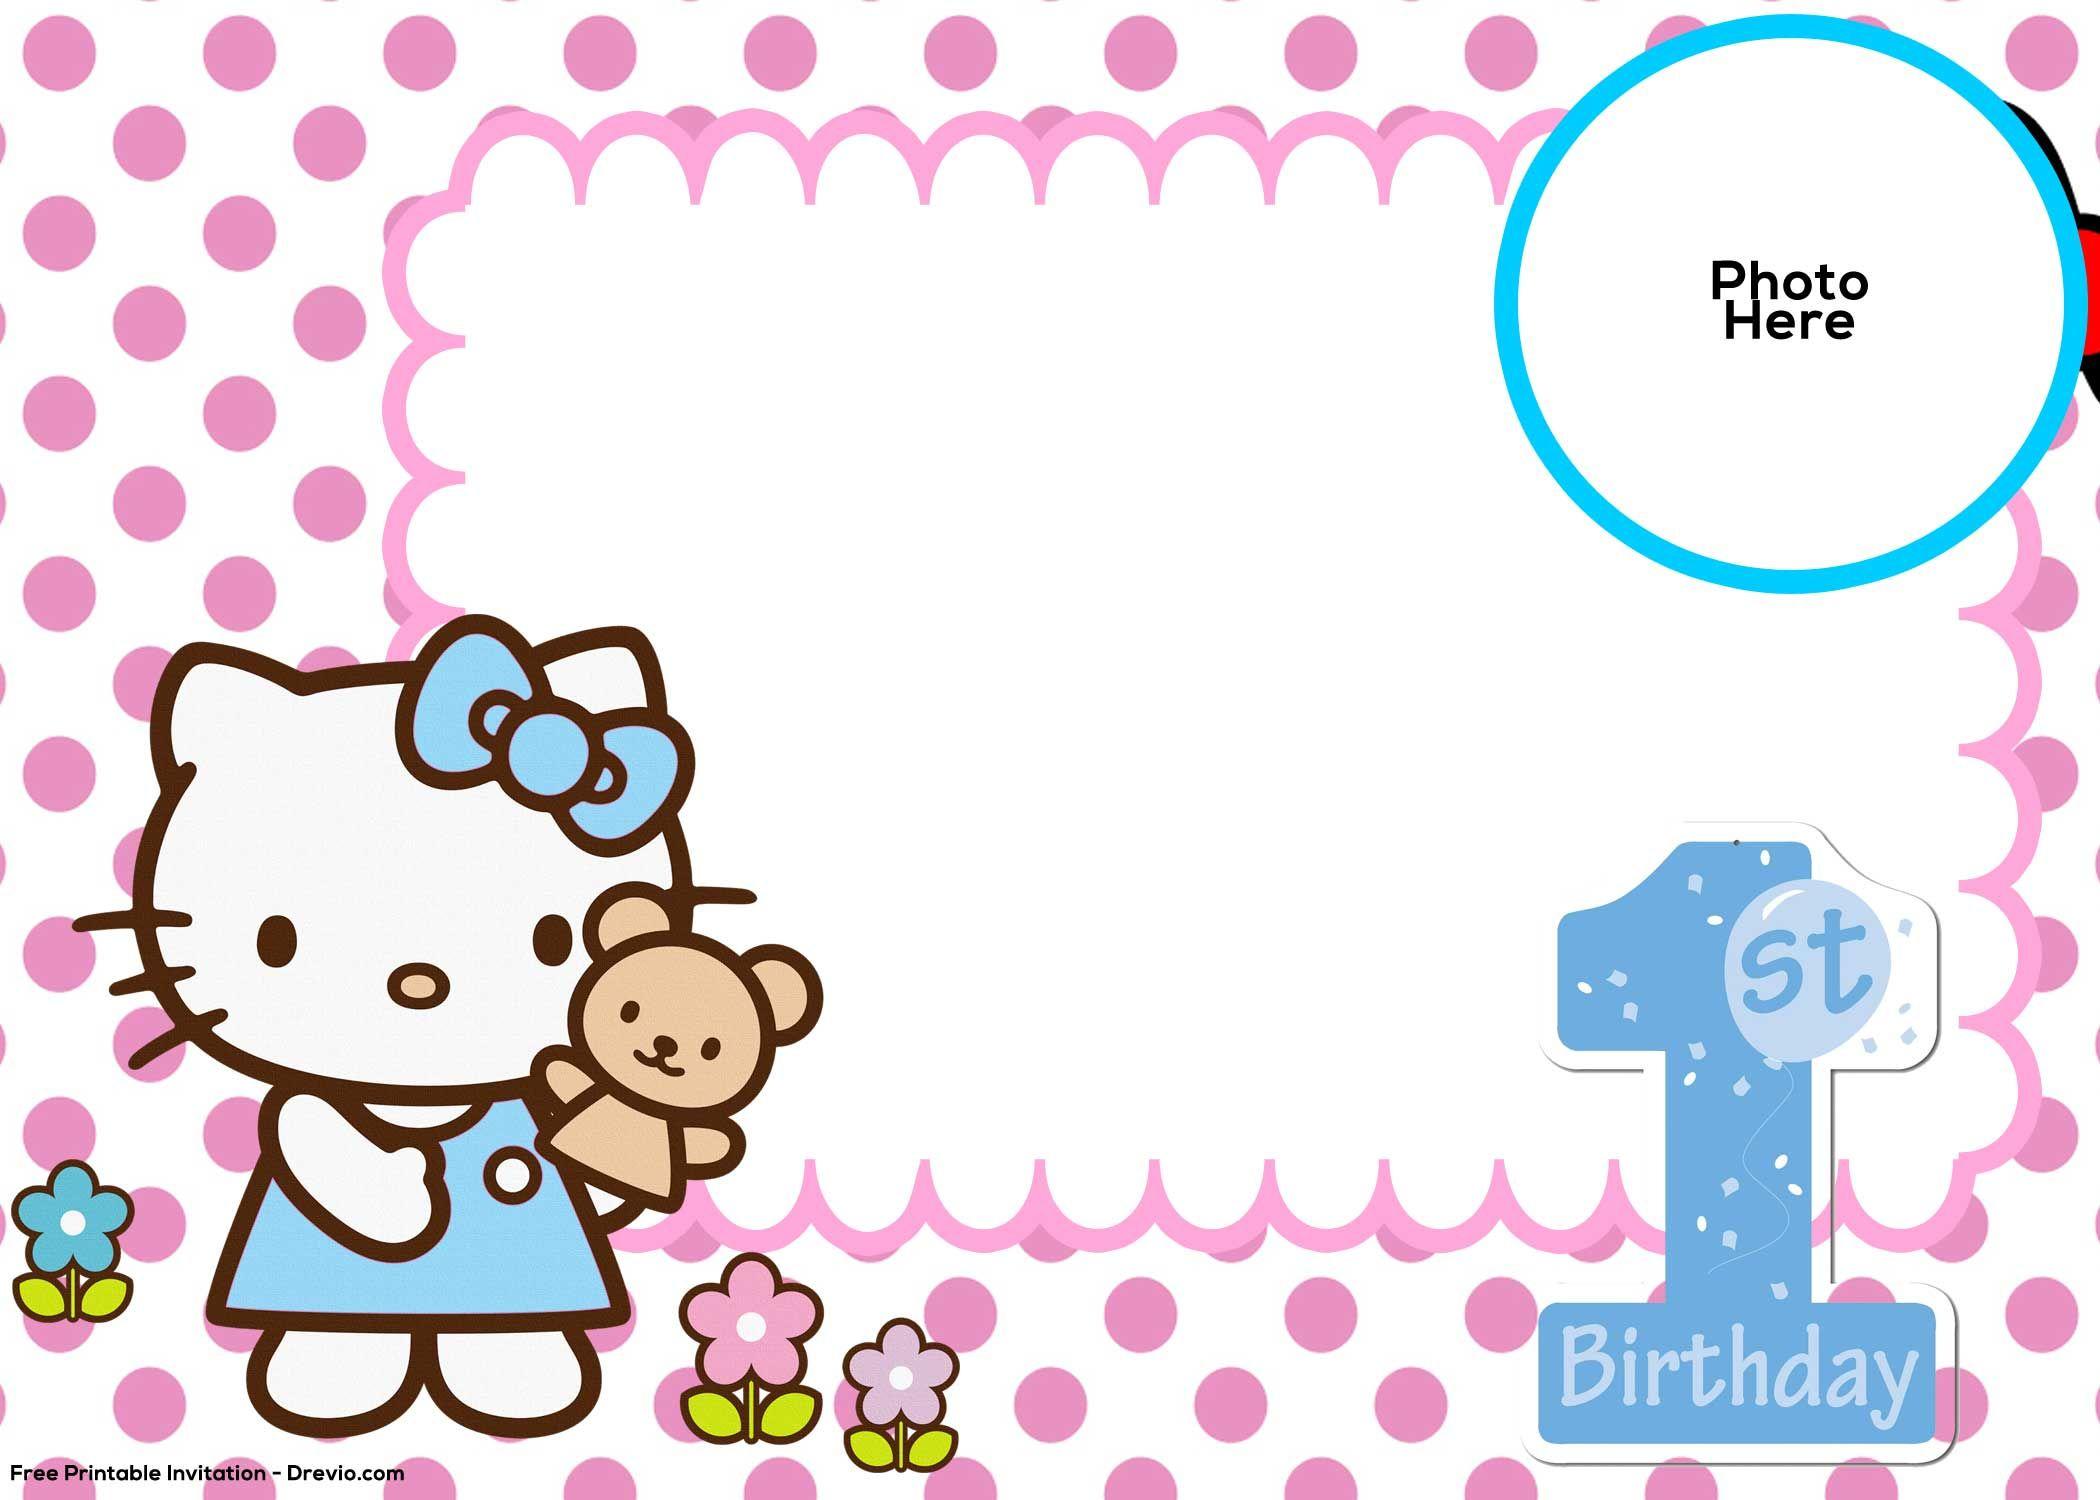 Free Hello Kitty 1St Birthday Invitation | Mickey | Pinterest - Hello Kitty Free Printable Invitations For Birthday